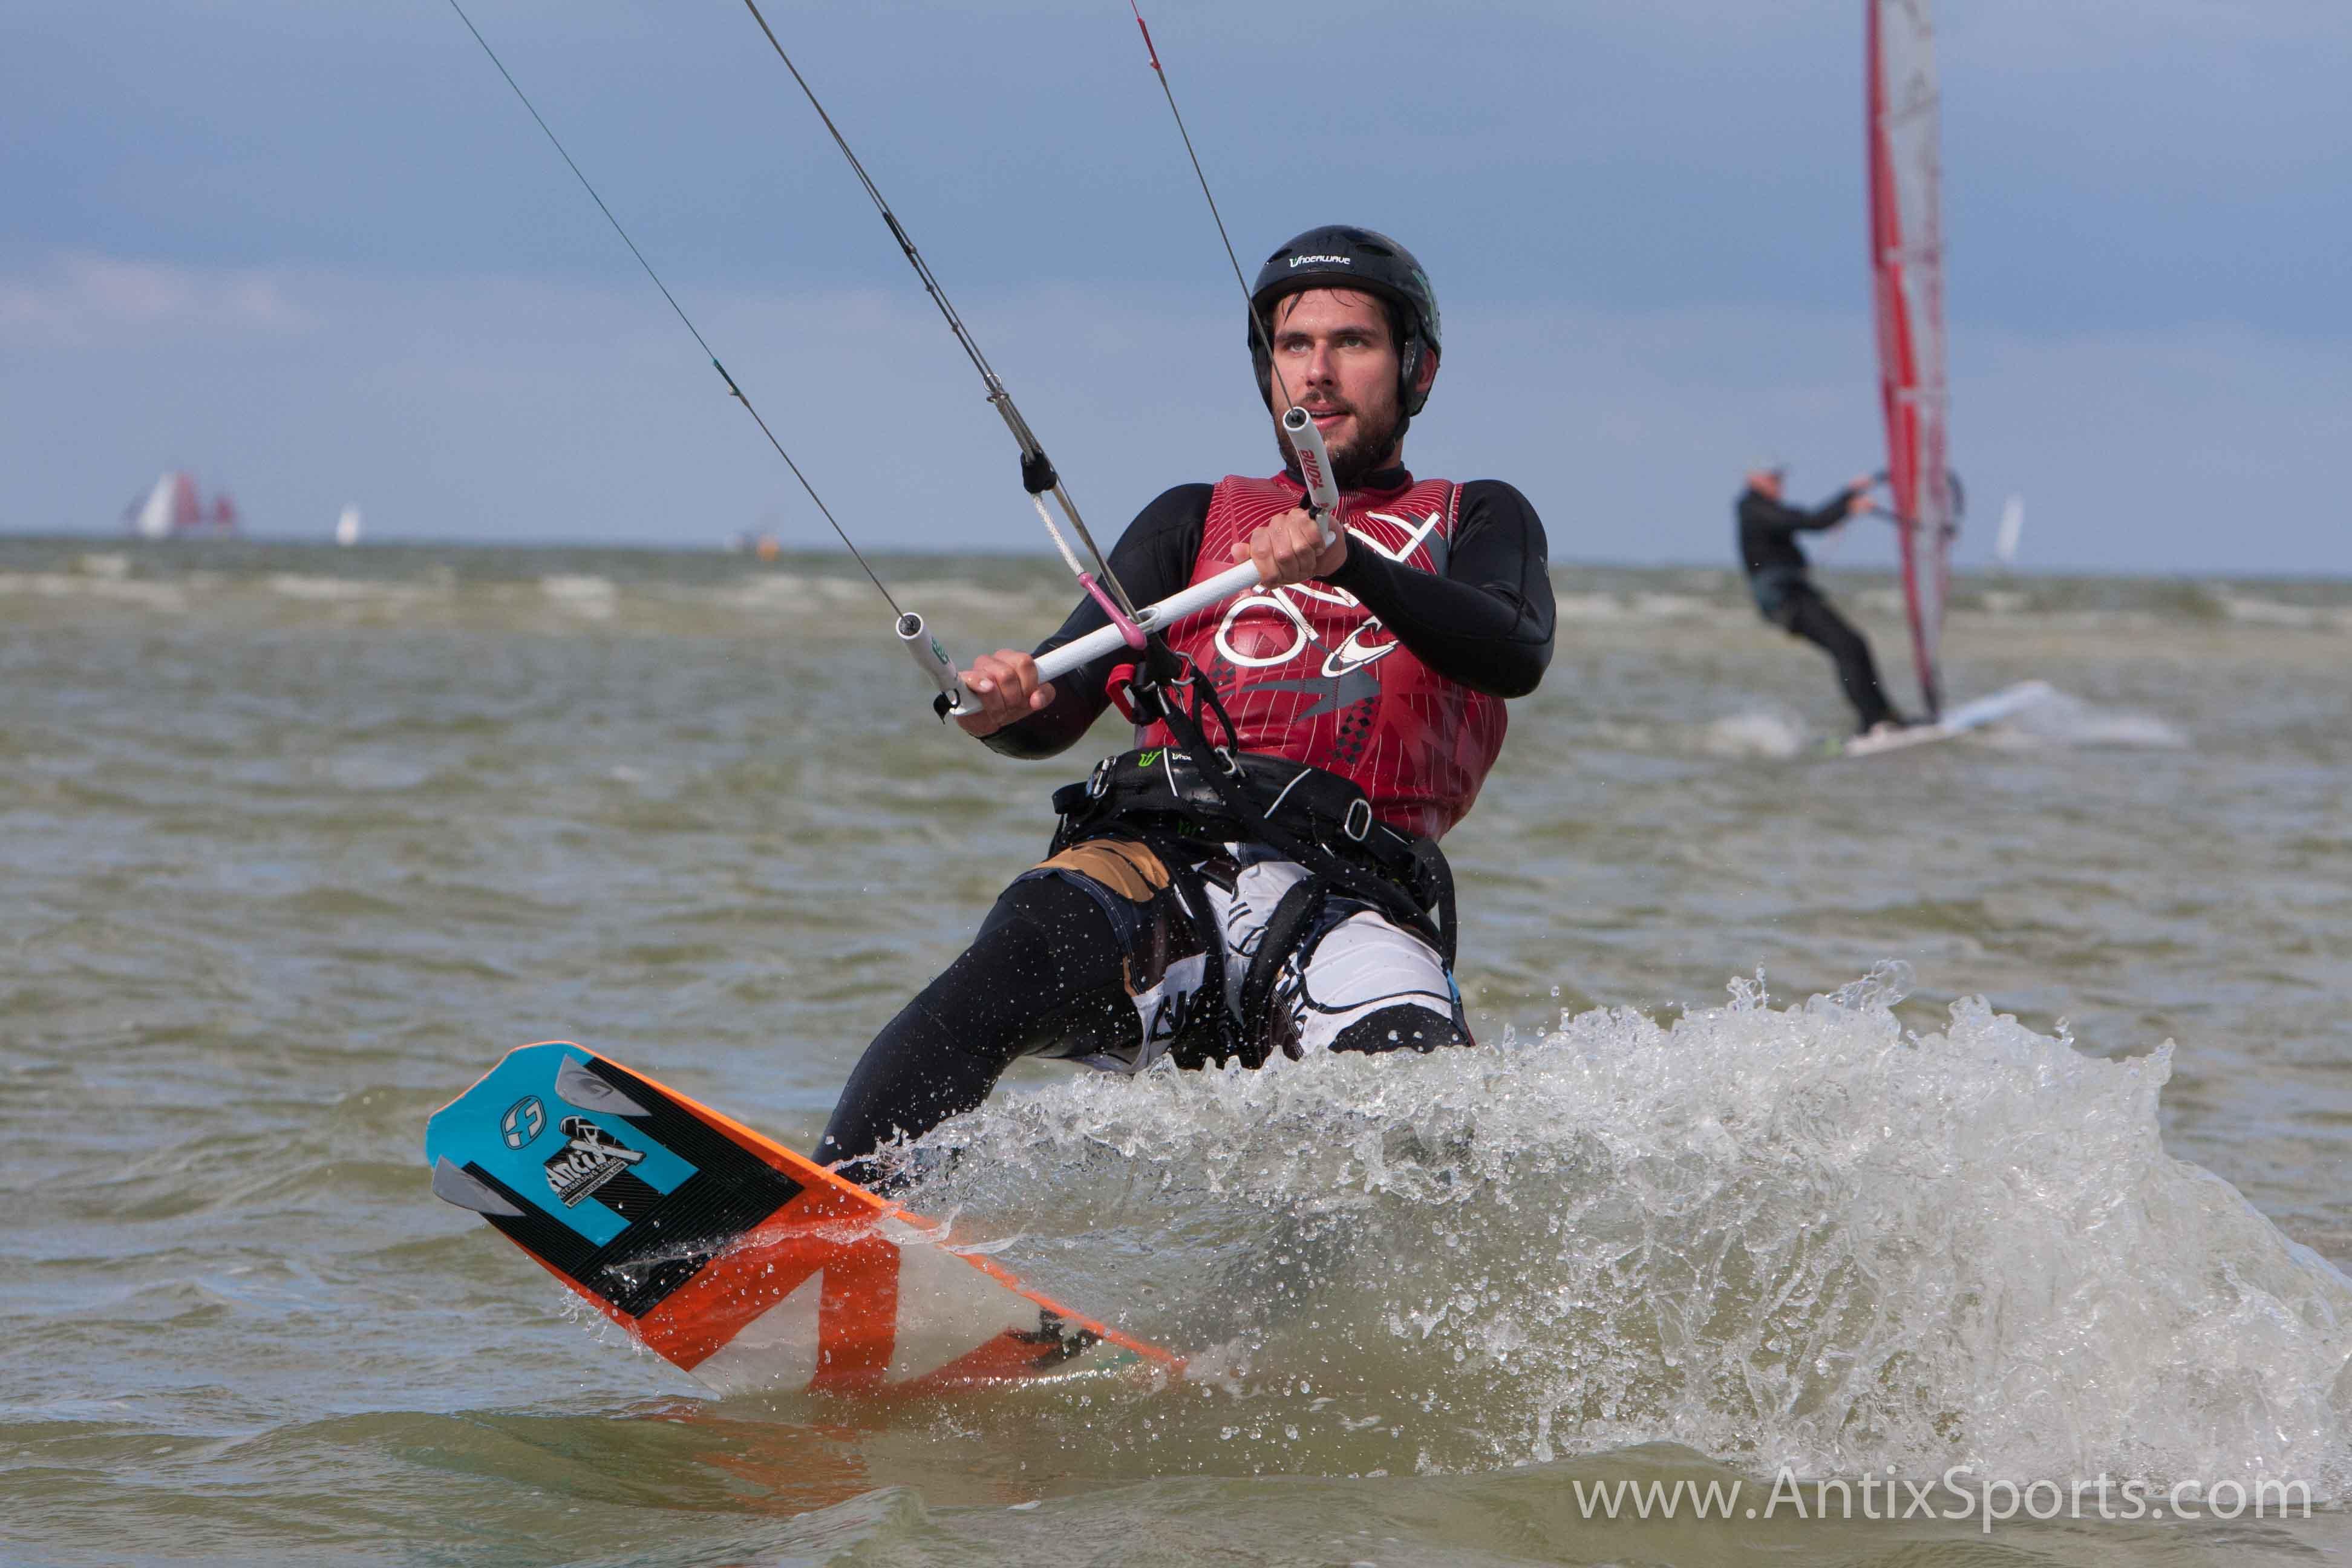 prive cursus kitesurfen